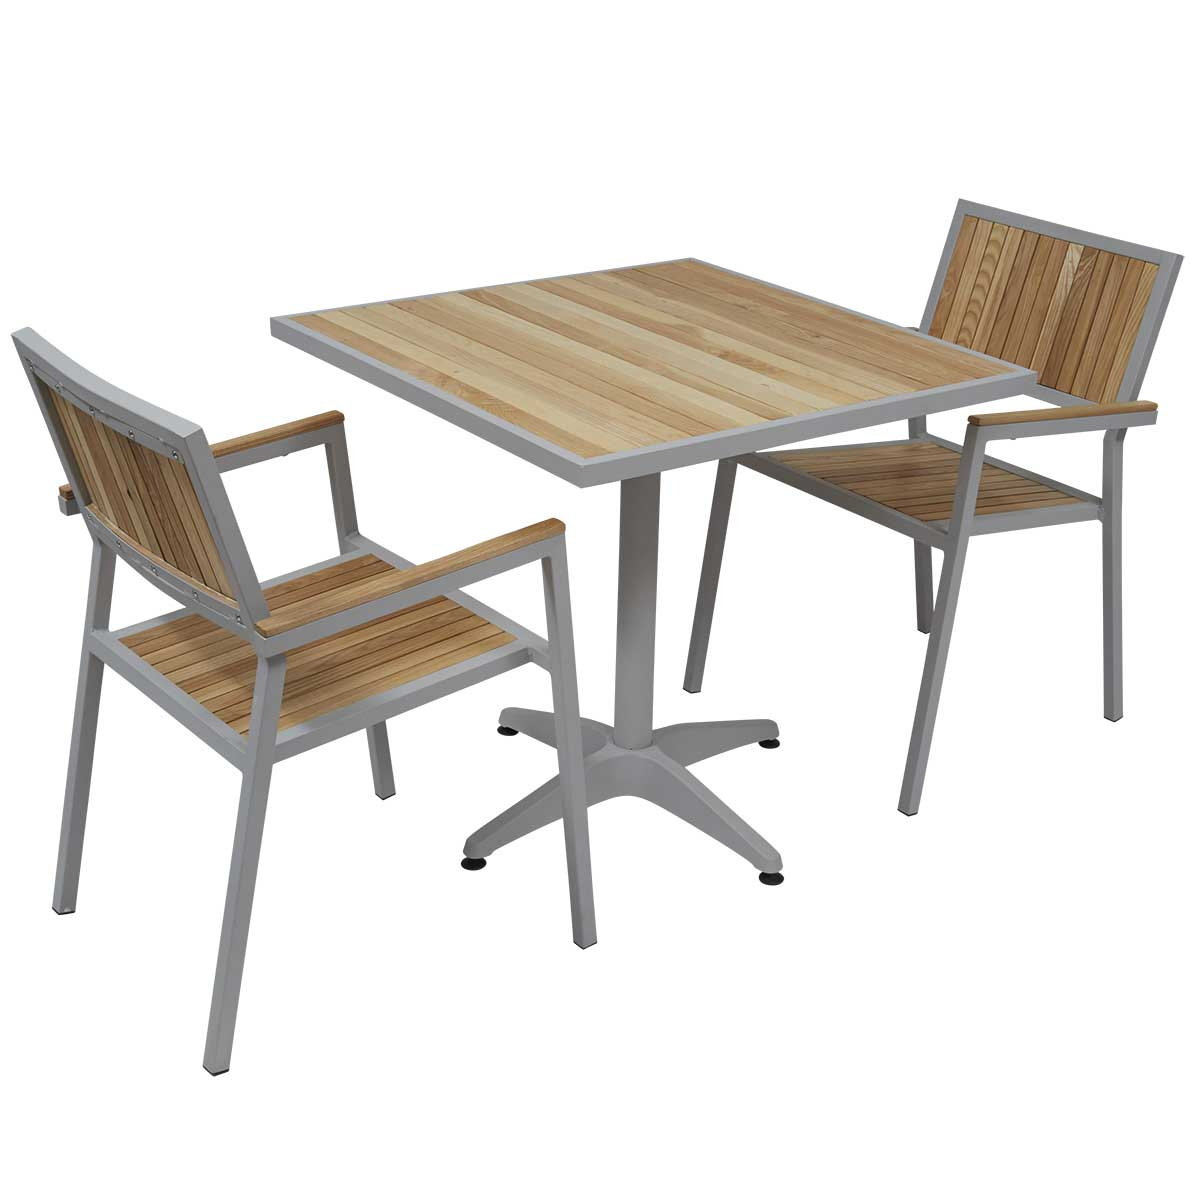 Table Jardin Carree Charmant Table Terrasse Pas Cher